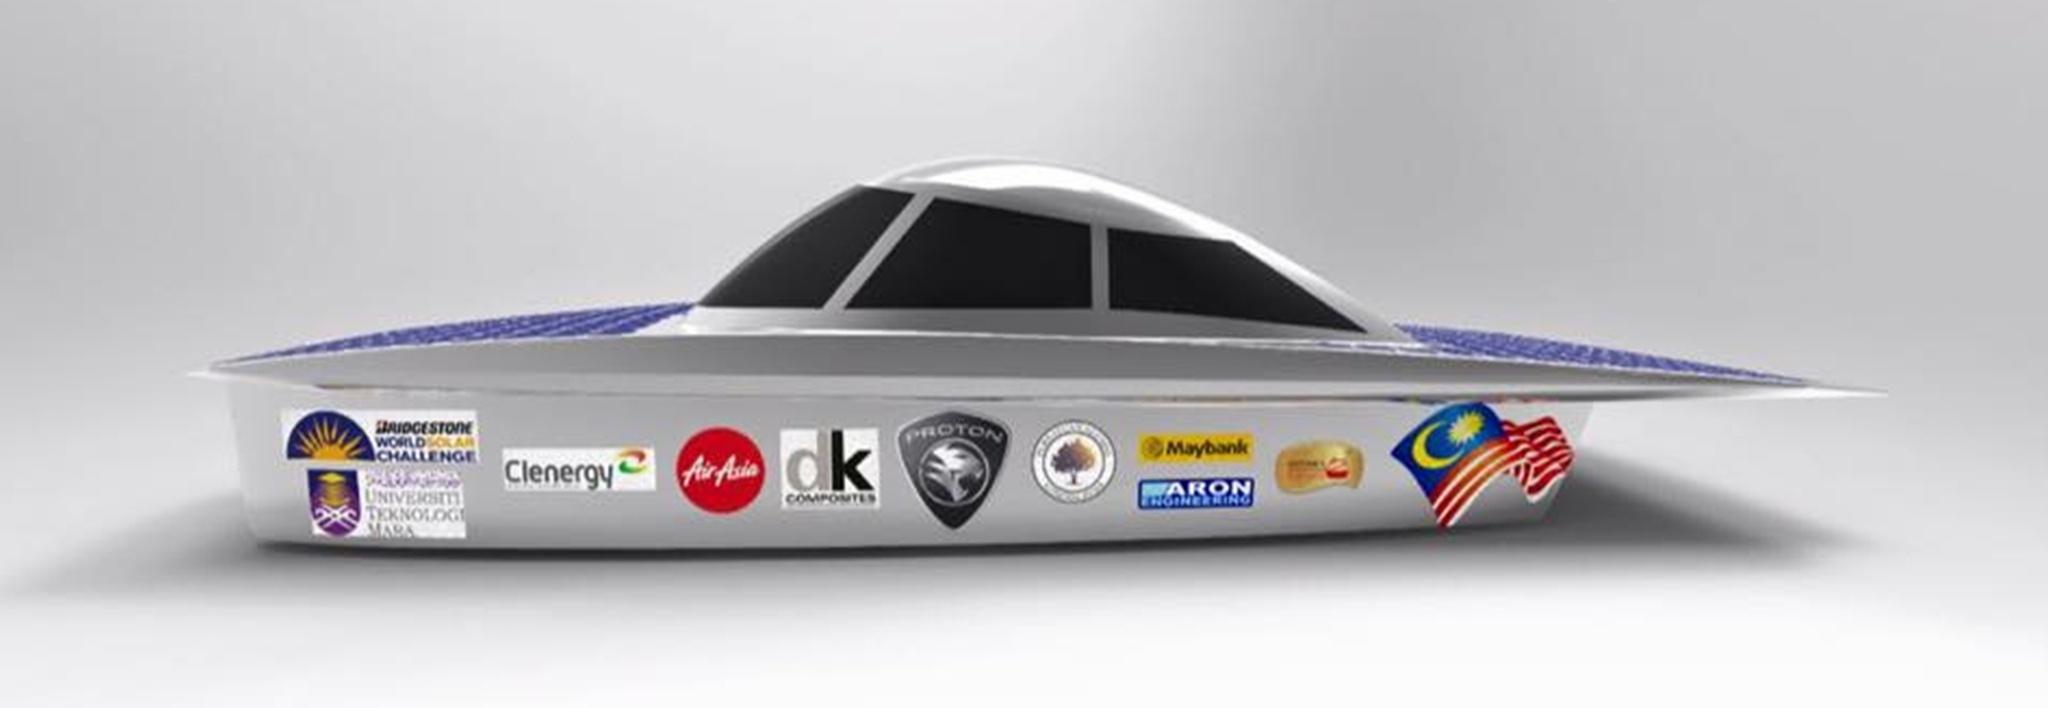 Malaysian Eco Photon UiTM Solar Car for the 2015 World Solar Challenge